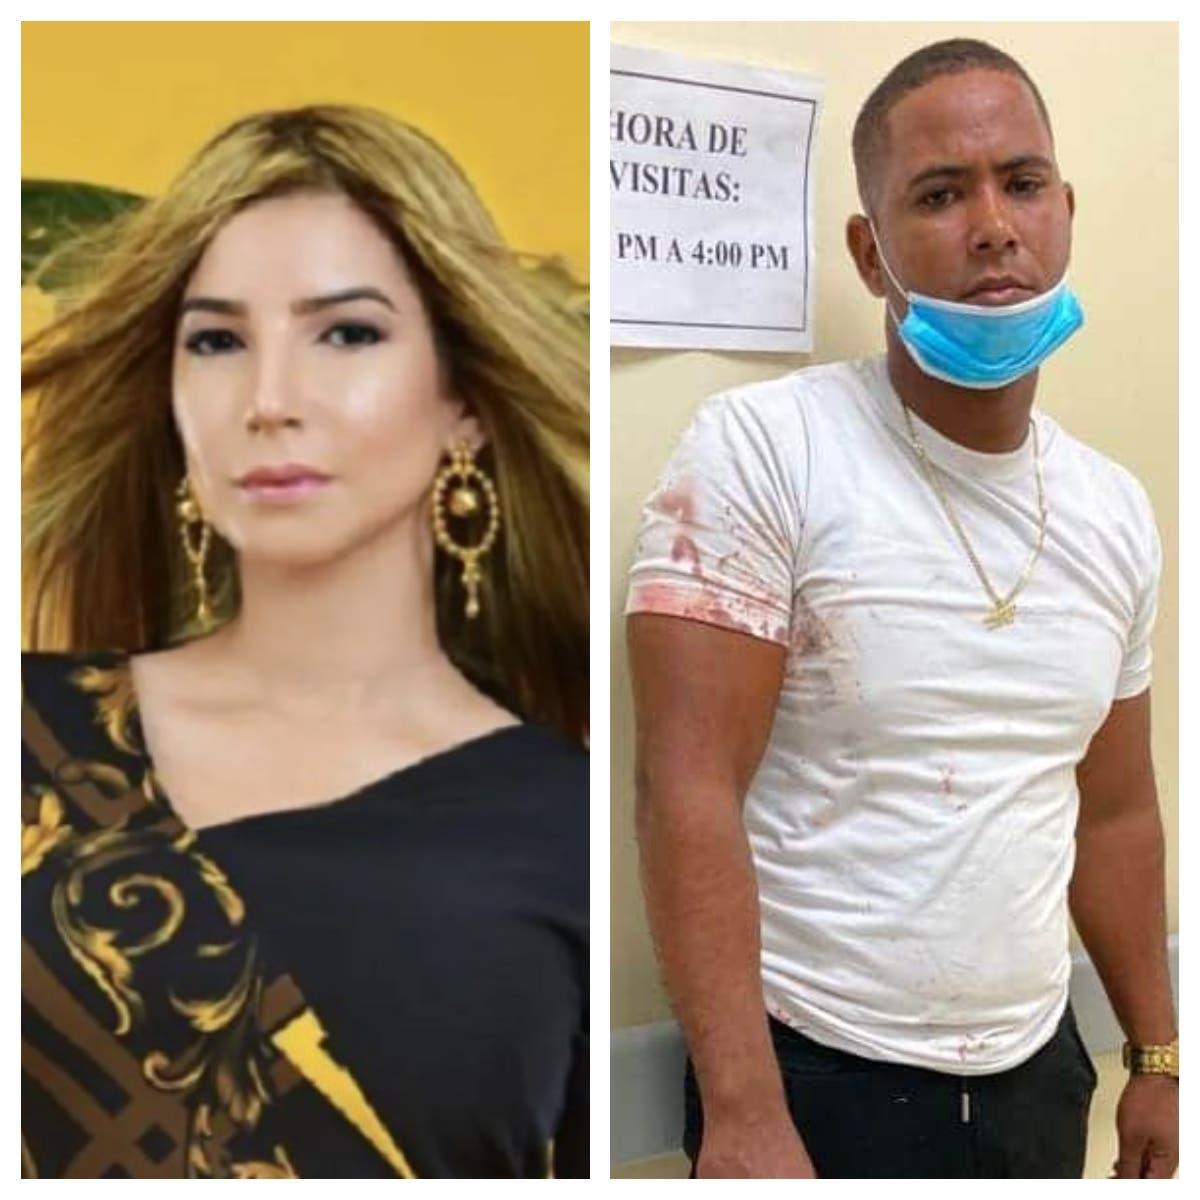 «A ese cabo alguien le pagó» para que asesinara a Leslie Rosado, dice Tahira Vargas